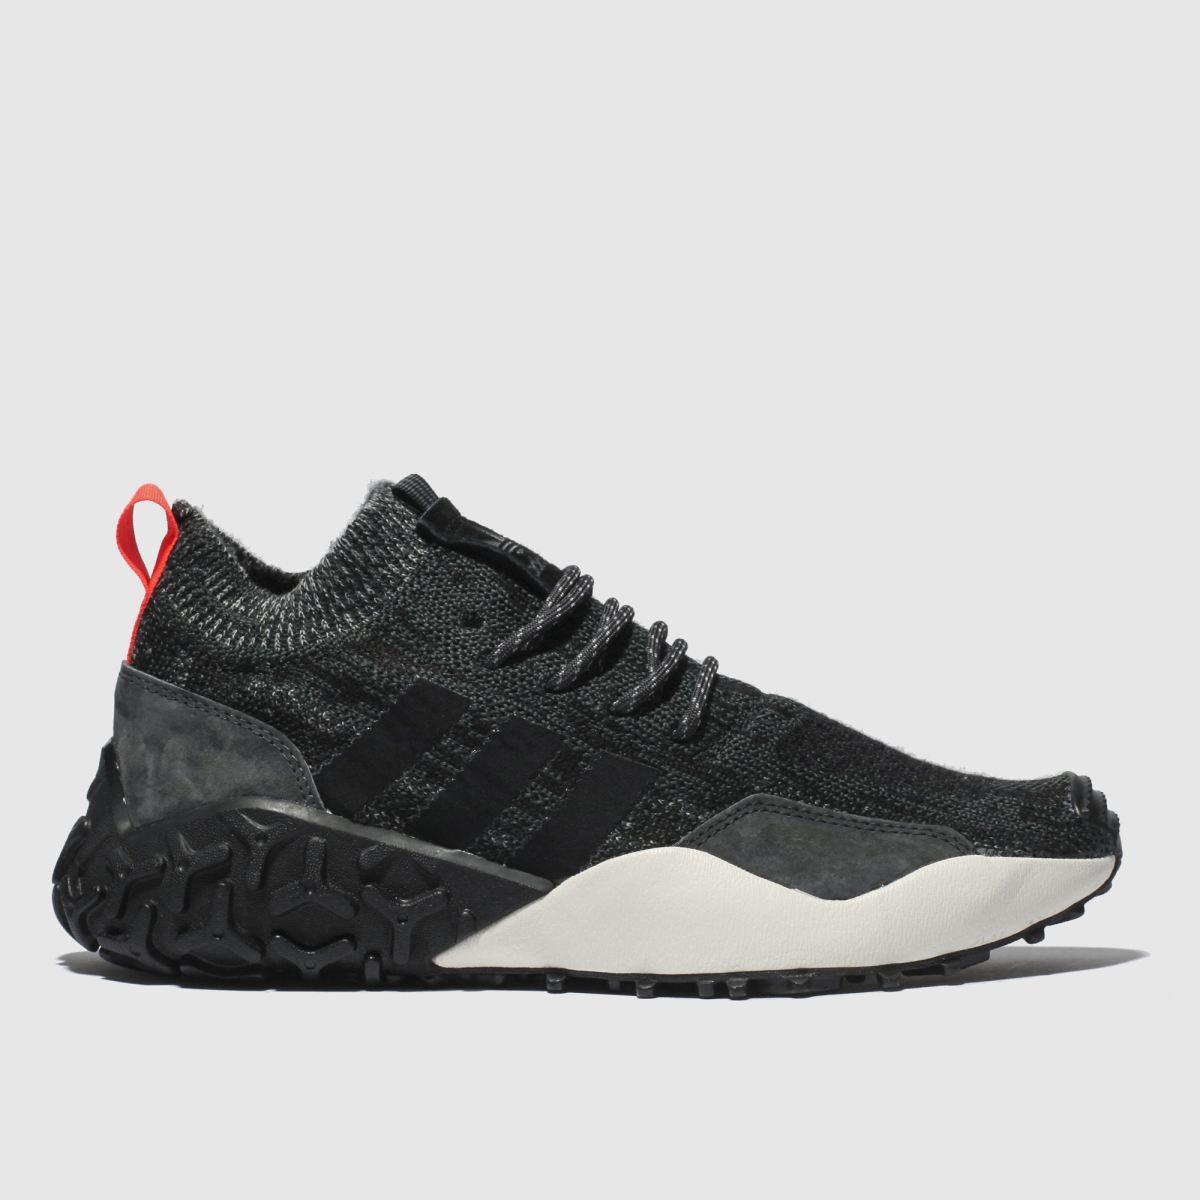 Adidas Black F/2 Tr Primeknit Trainers